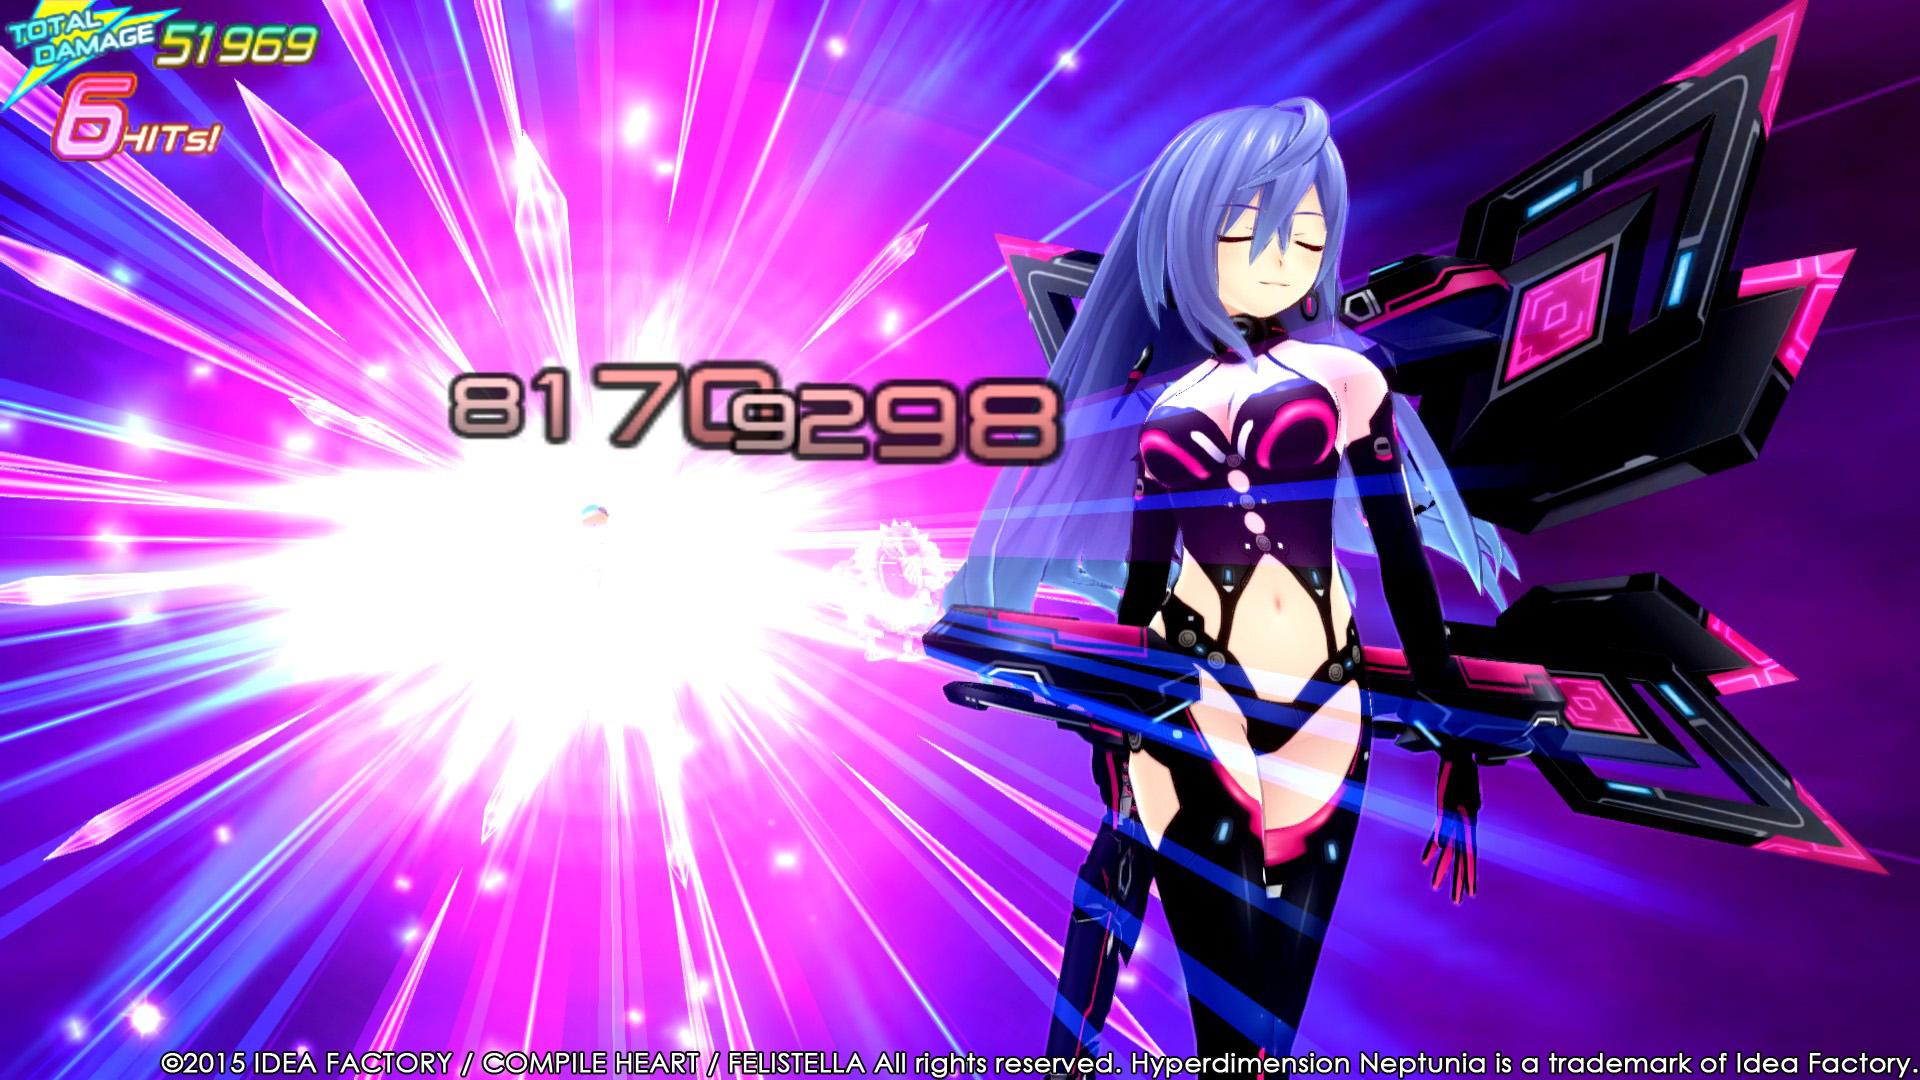 Hyperdimension Neptunia Re;Birth3 V Generation game image